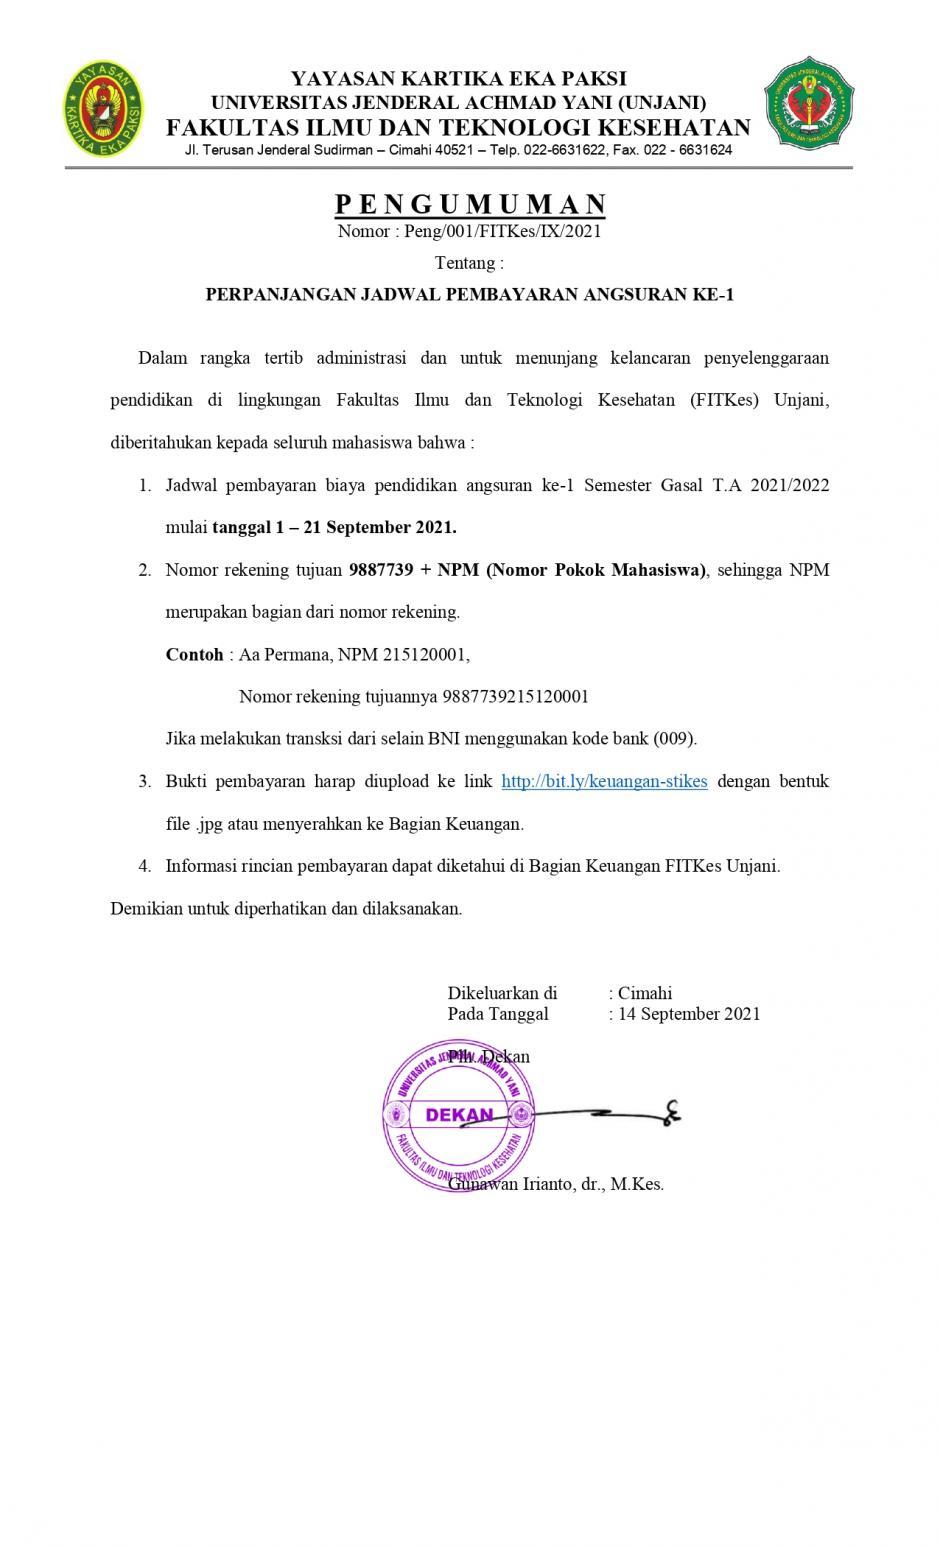 Perpanjangan Jadwal Pembayaran Angsuran ke-1 Semester Gasal T.A. 2021/2022